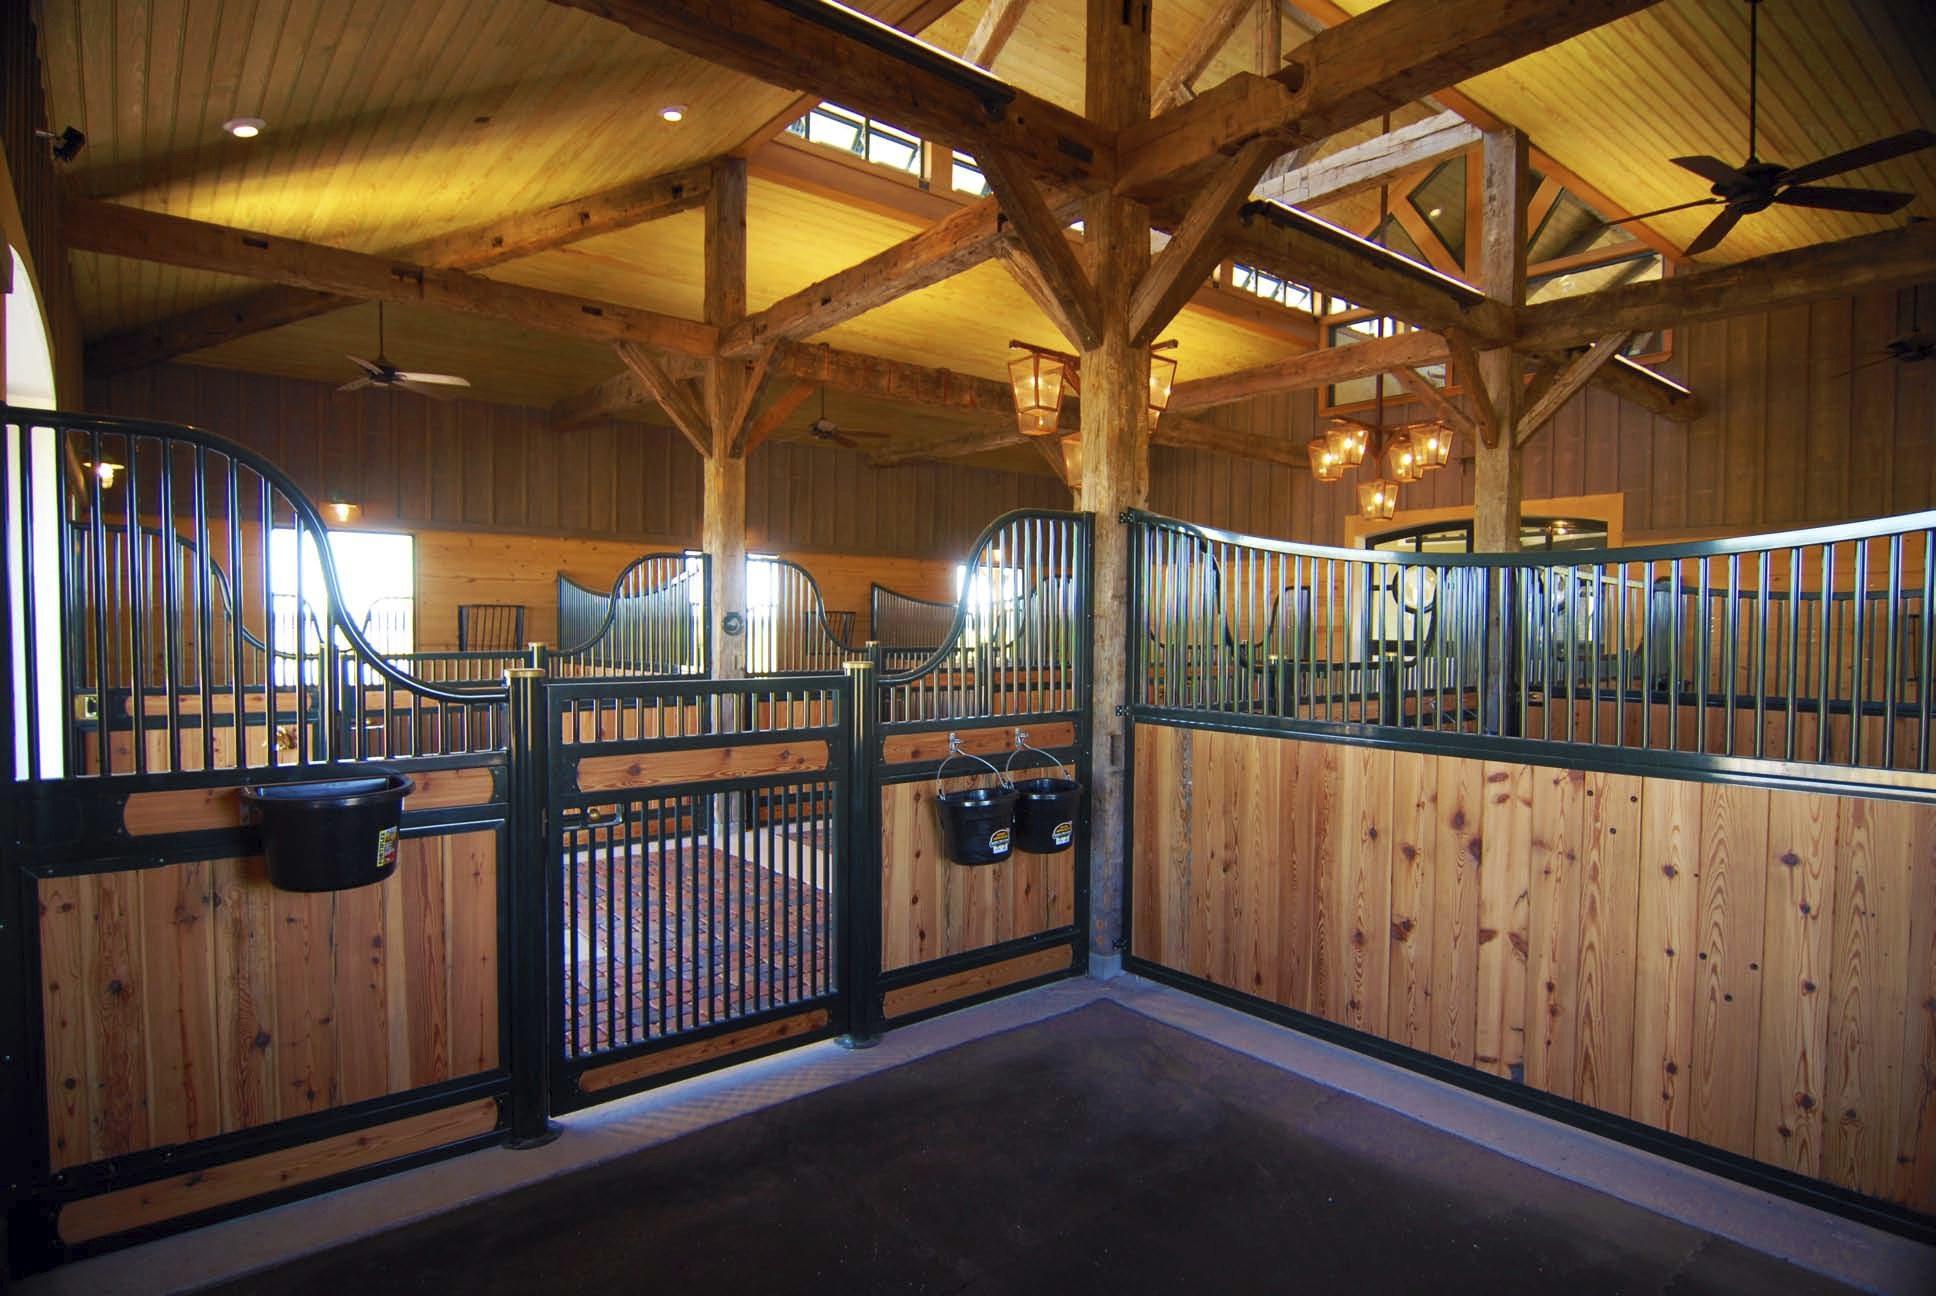 Private Horse Farm Jb Mouton